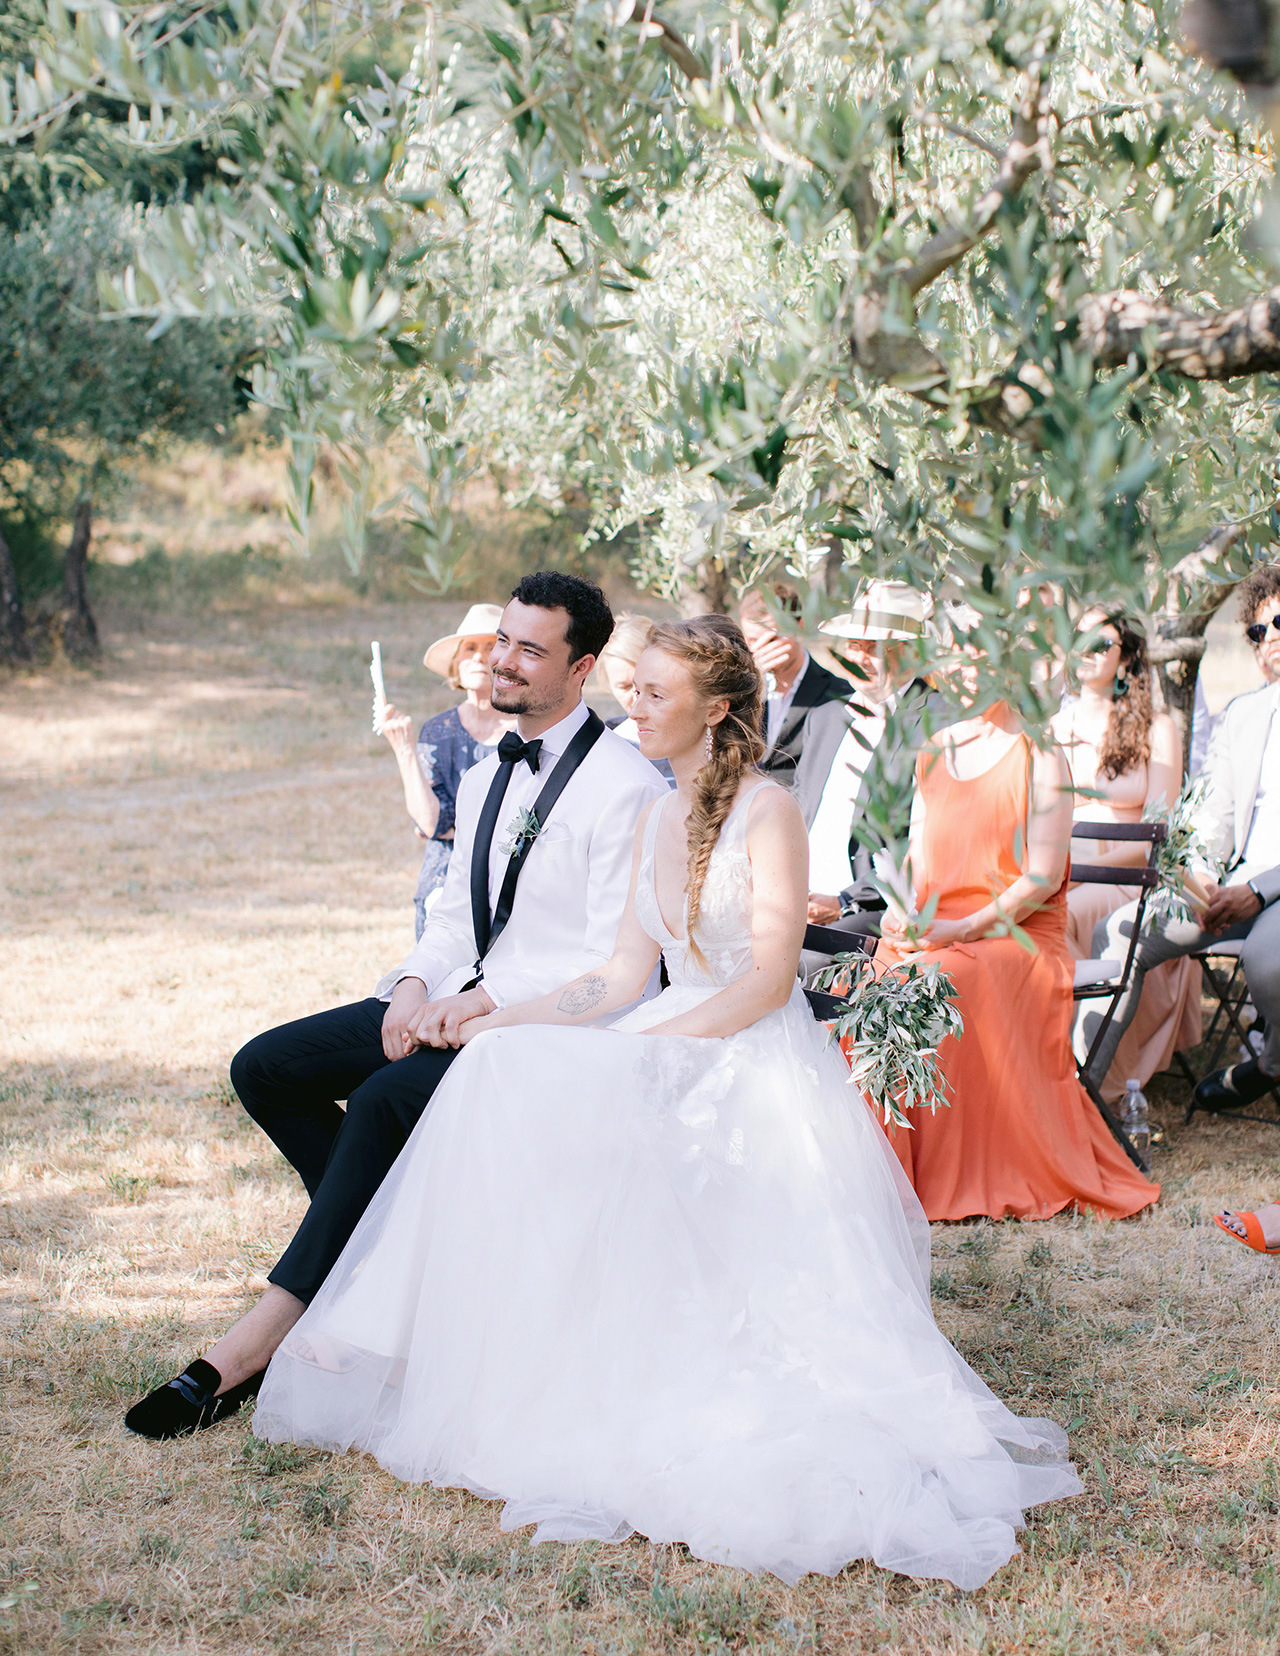 bride groom sitting wedding reception outdoors